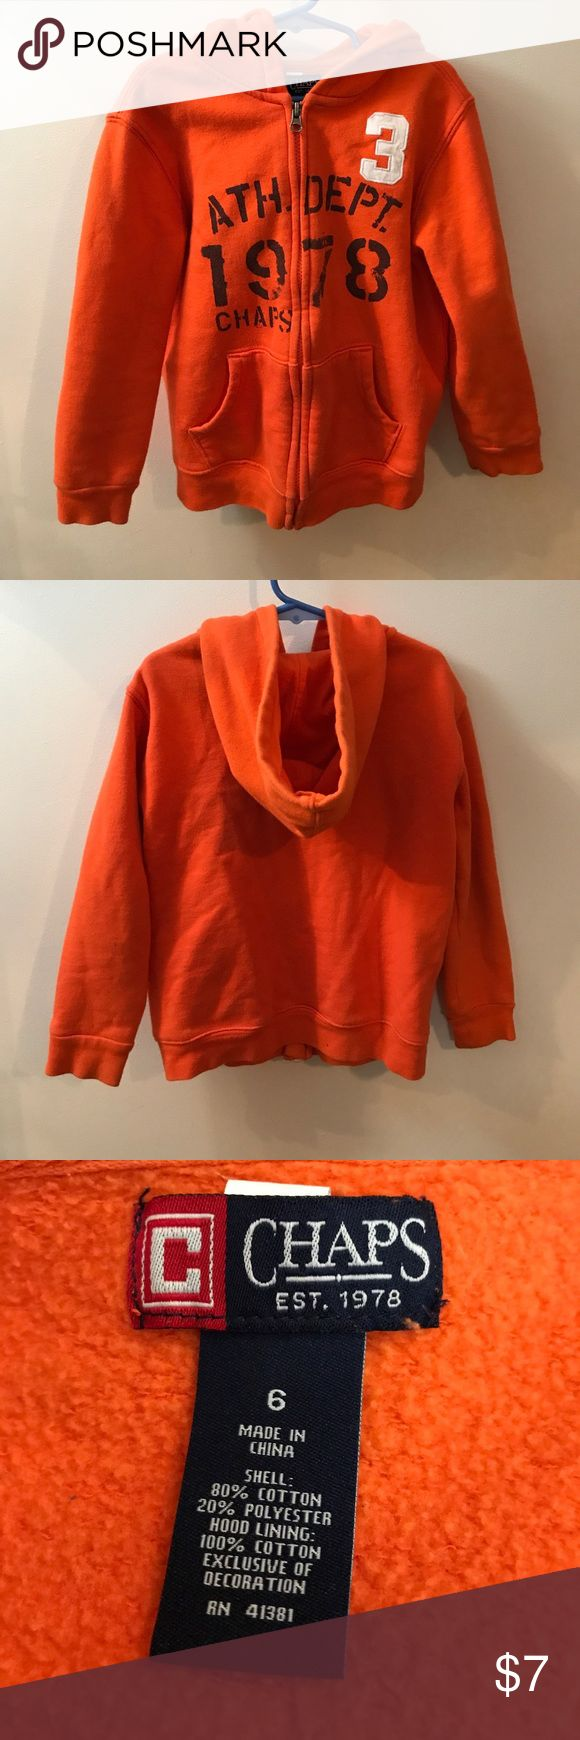 Chaps Zip Up Hoodie EUC Chaps orange  zip up hoodie with graphic design. Size 6. Chaps Shirts & Tops Sweatshirts & Hoodies